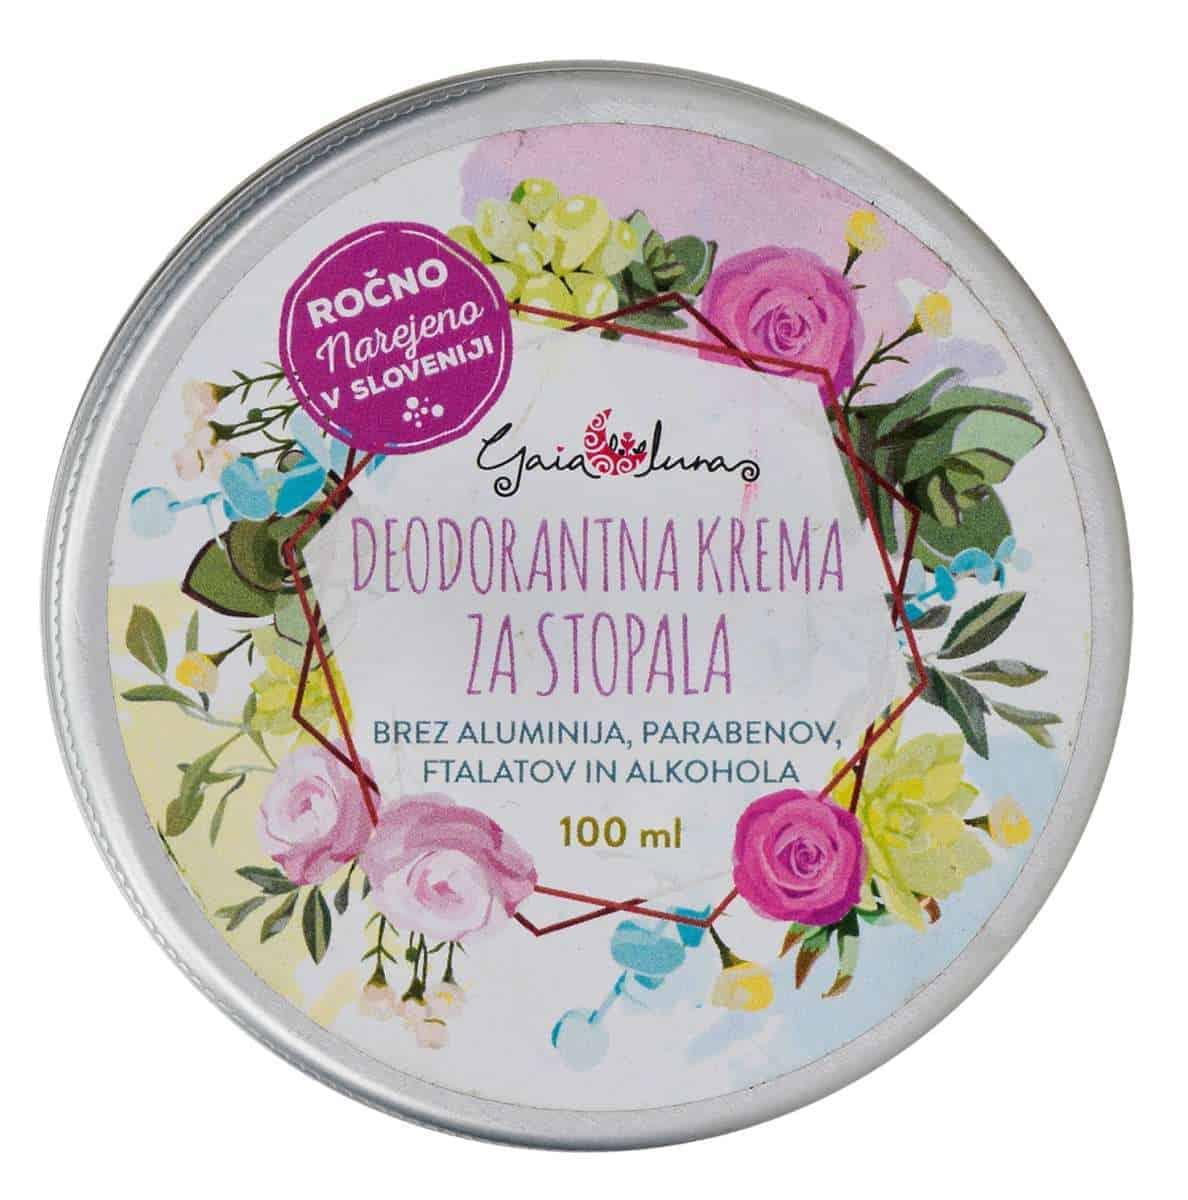 Deodorantna krema za stopala, GaiaLuna domača kozmetika